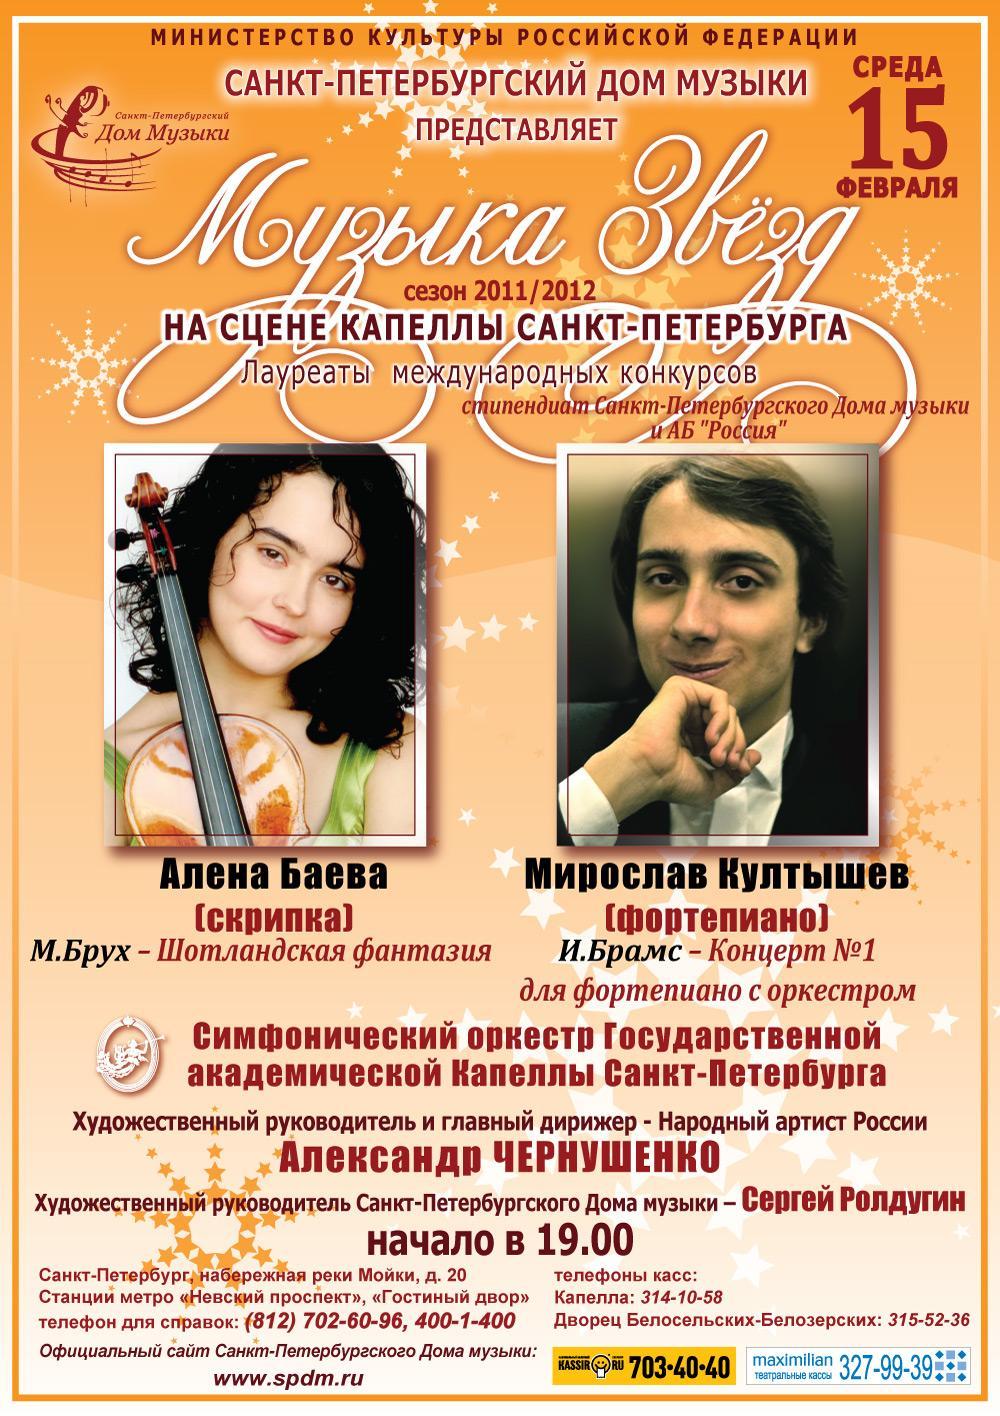 Парад звезд: Мирослав Култышев и Алена Баева в одном вечере Дома музыки